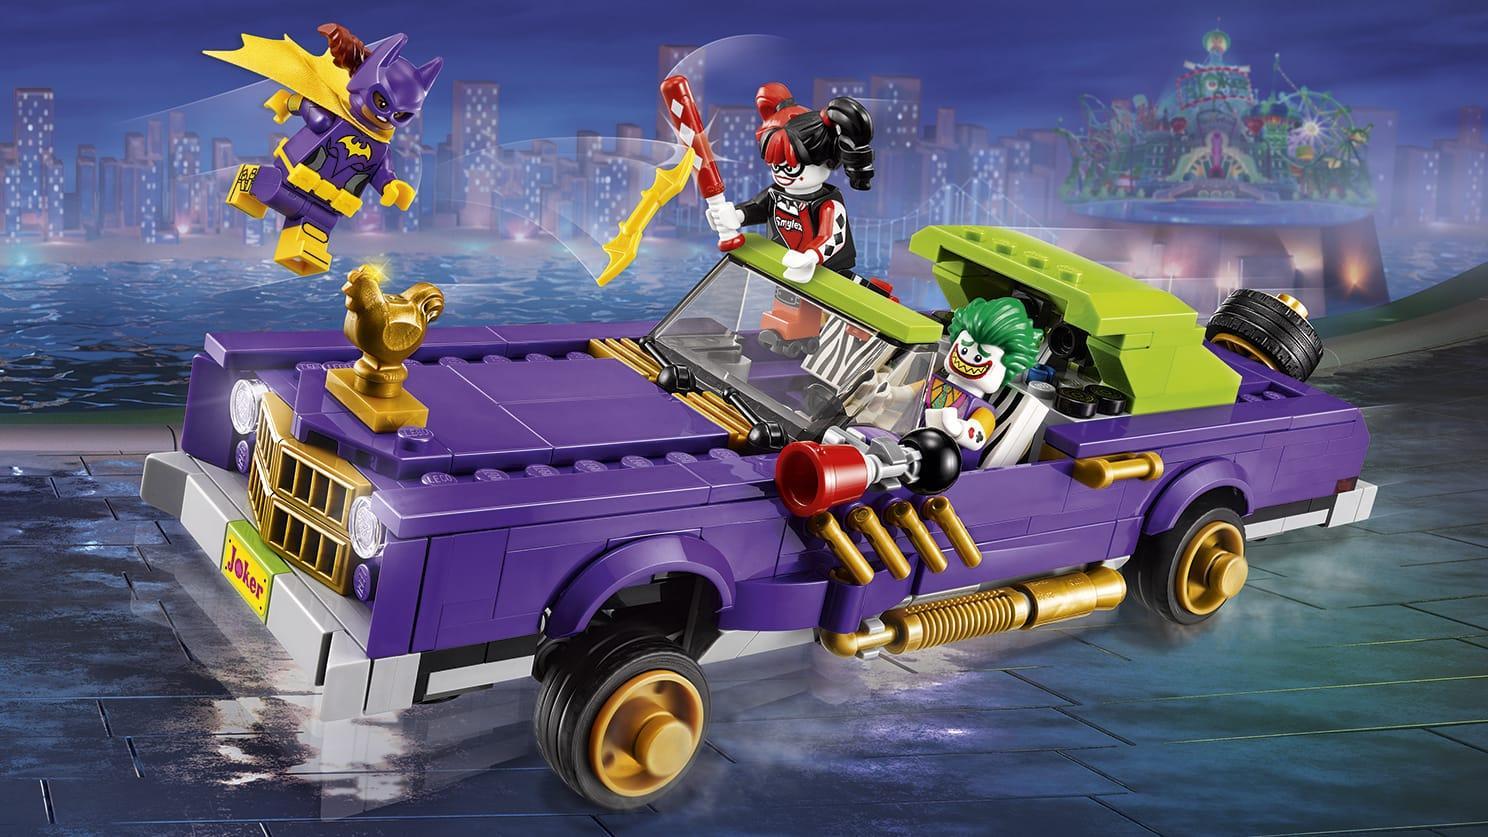 Amazon.com: THE LEGO BATMAN MOVIE The Joker Notorious